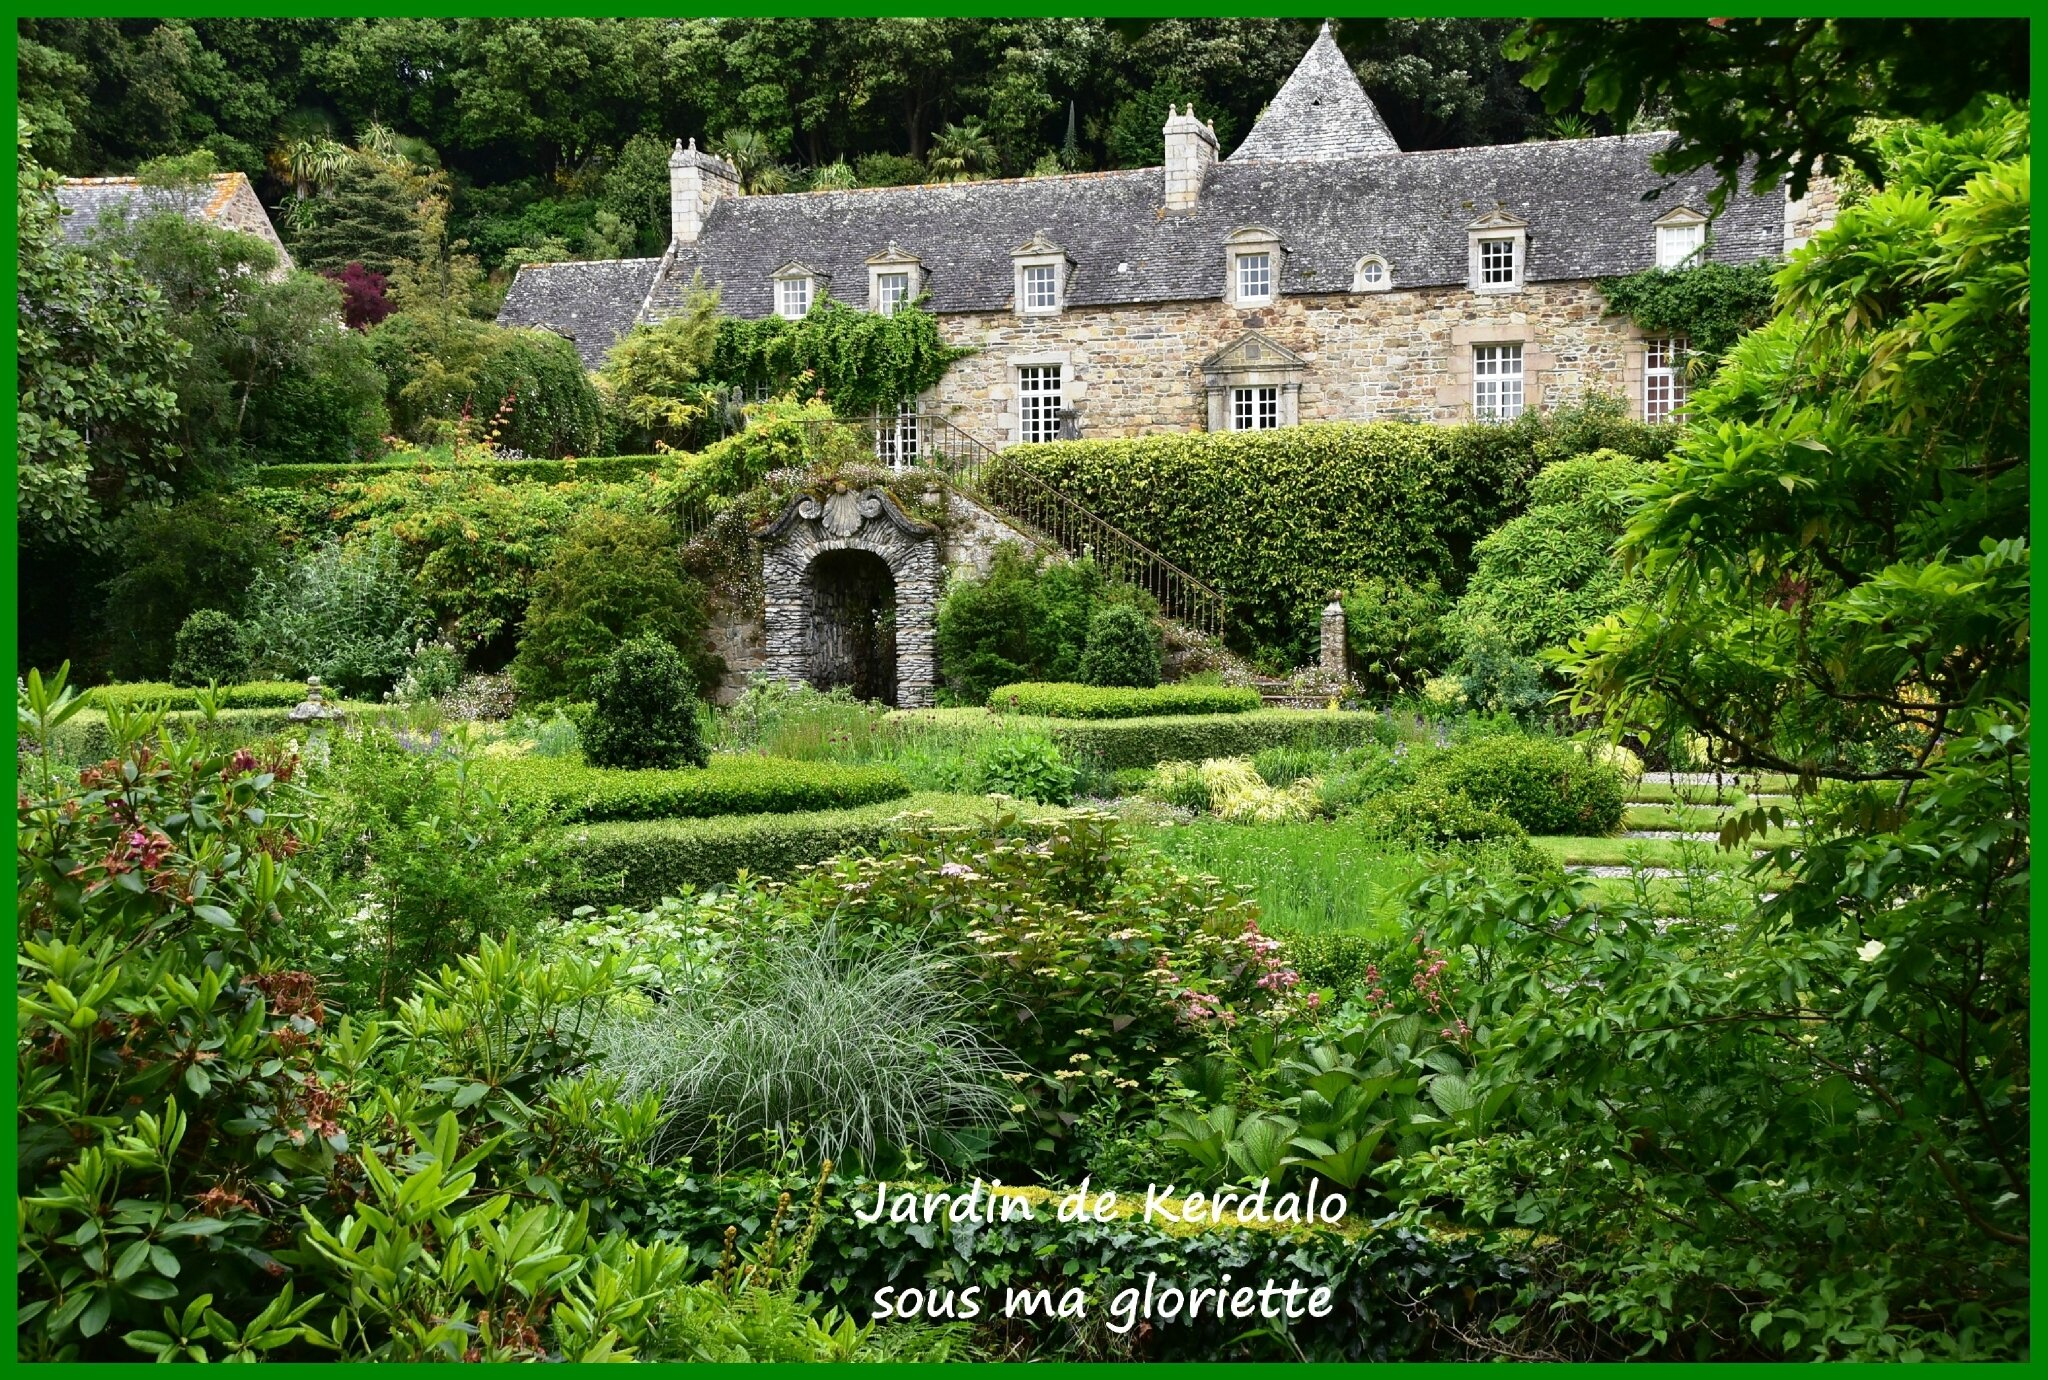 Les Jardins De Kerdalo A 22 Tredarzec Sous Ma Gloriette